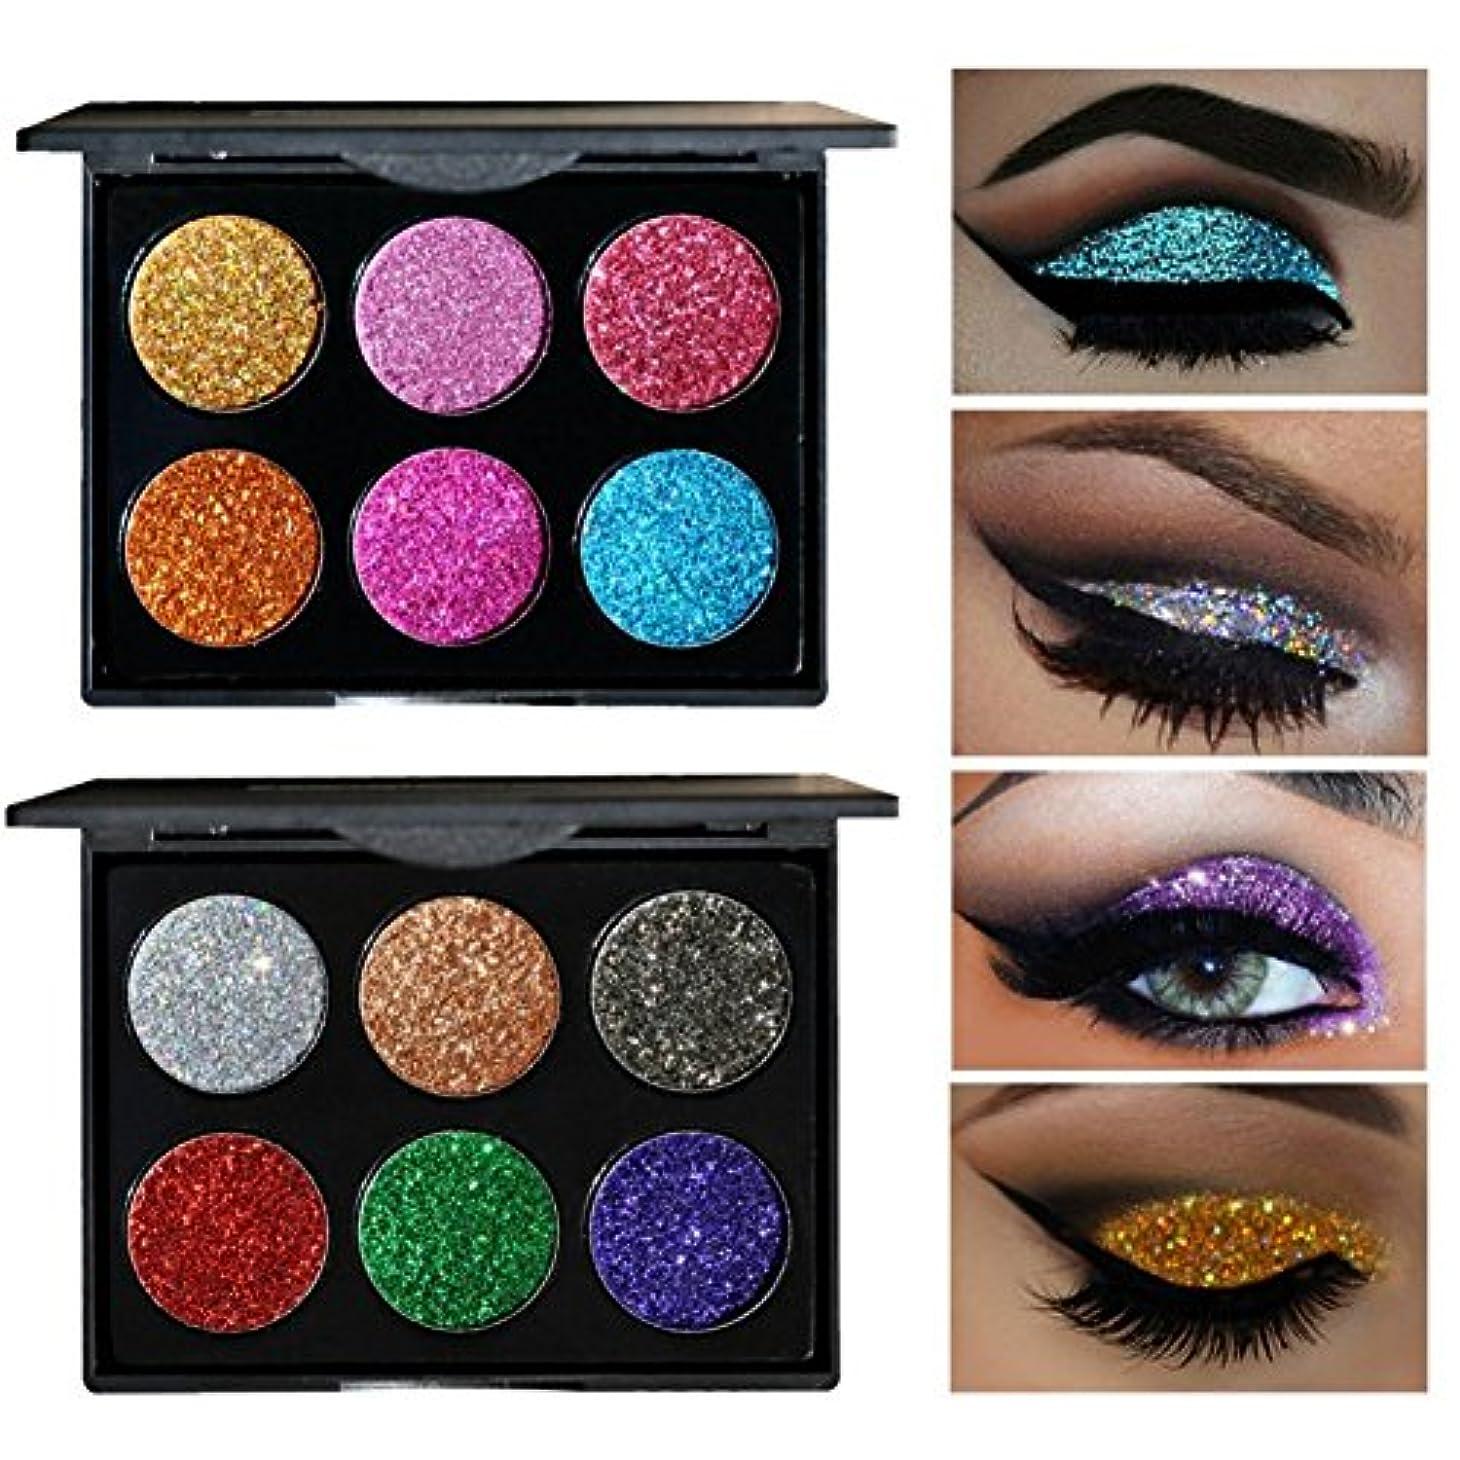 HANDAIYAN 6 Colors Glitter Eye Shadow Brighten Palette Flash Shimmer Natural Glitter Fix Gel Cosmetic Makeup Body...